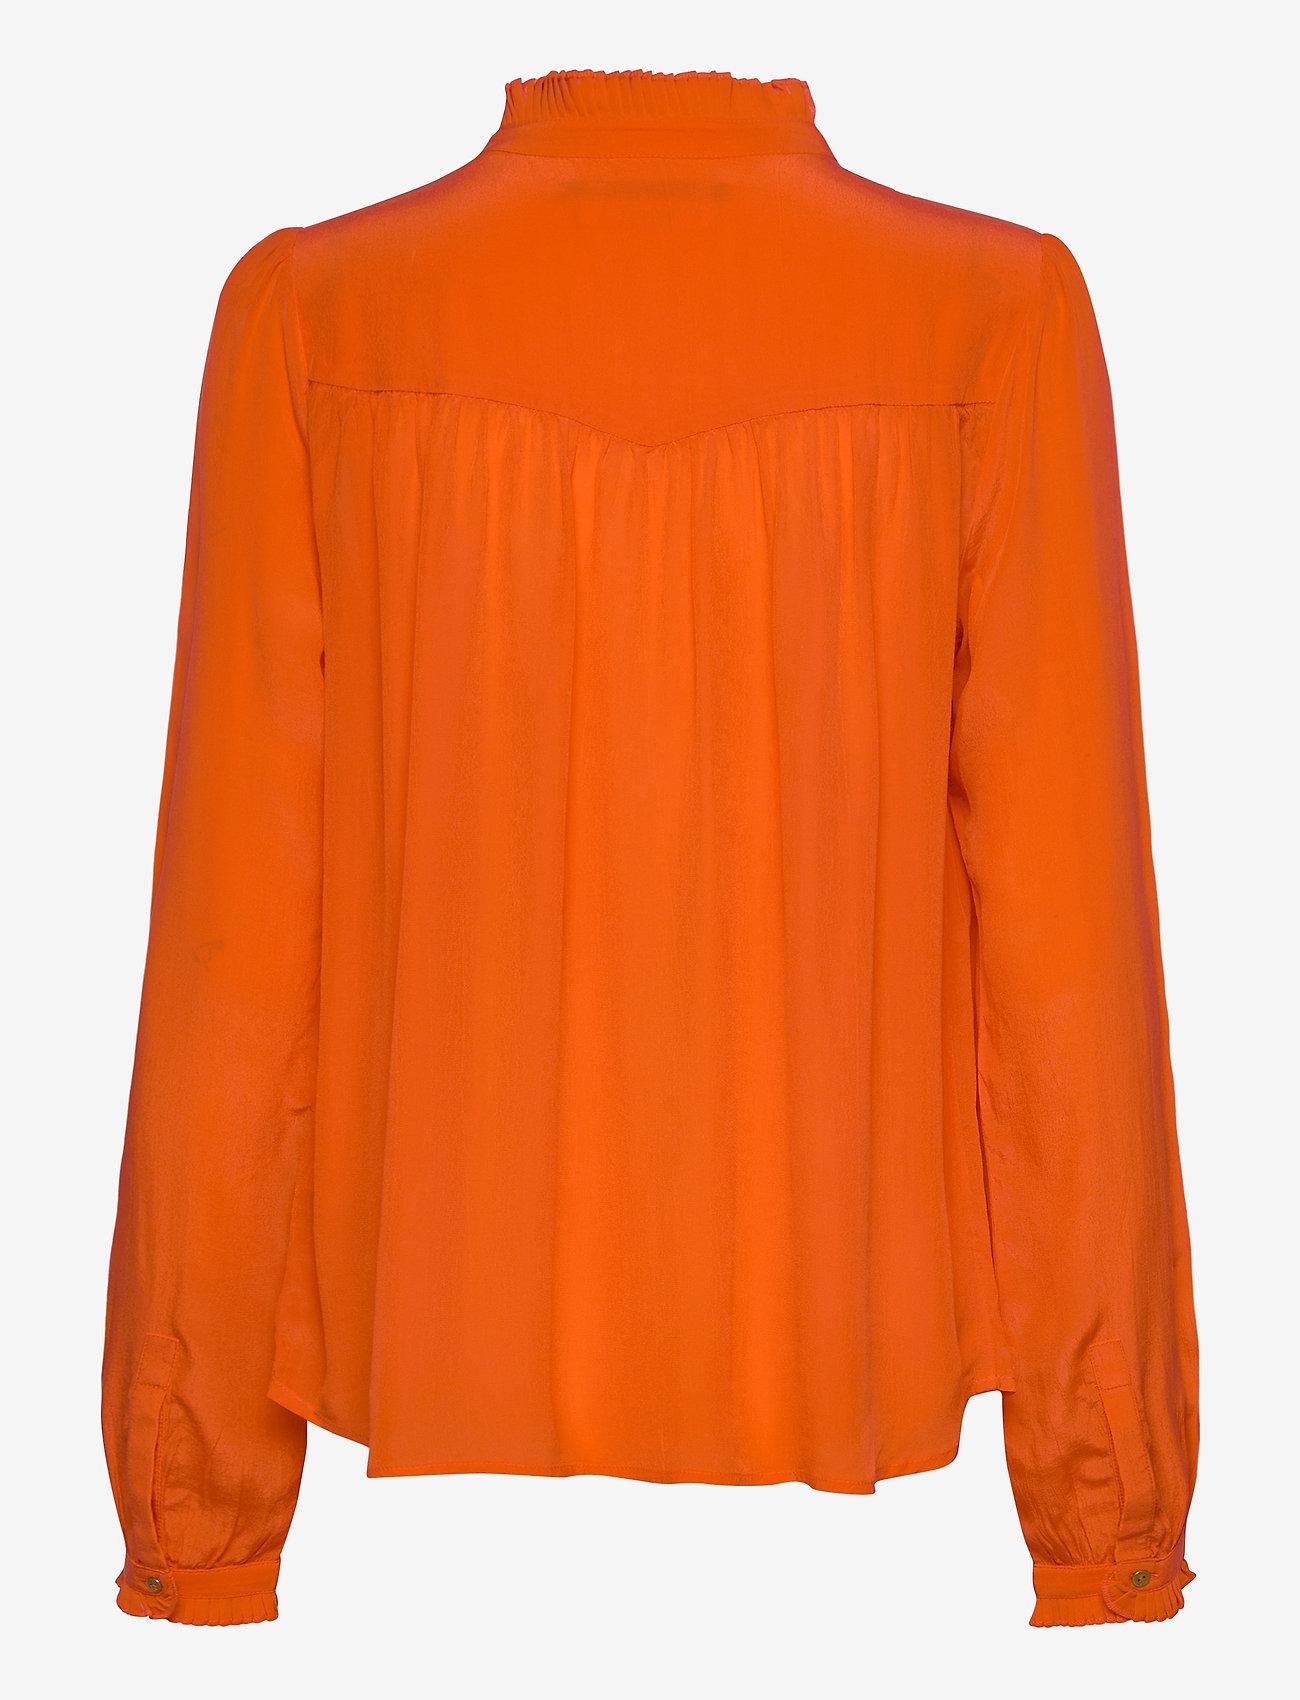 Scotch & Soda - Feminine shirt with pleated detailing - chemises à manches longues - orange shell - 1